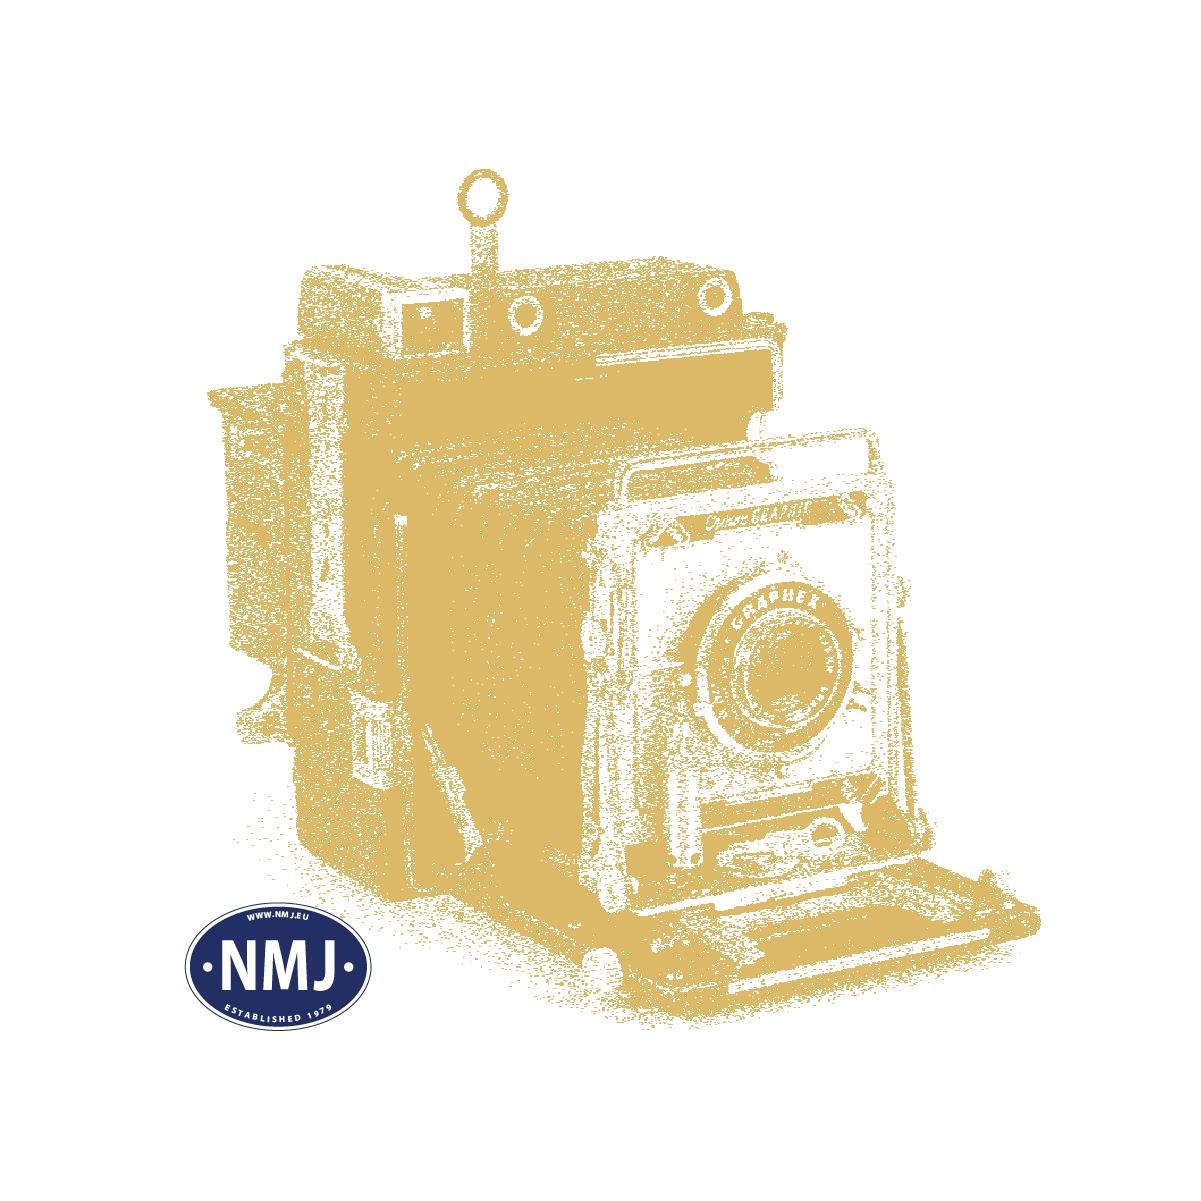 NMJS21a176 - NMJ Superline NSB Damplok Type 21a 176, original version